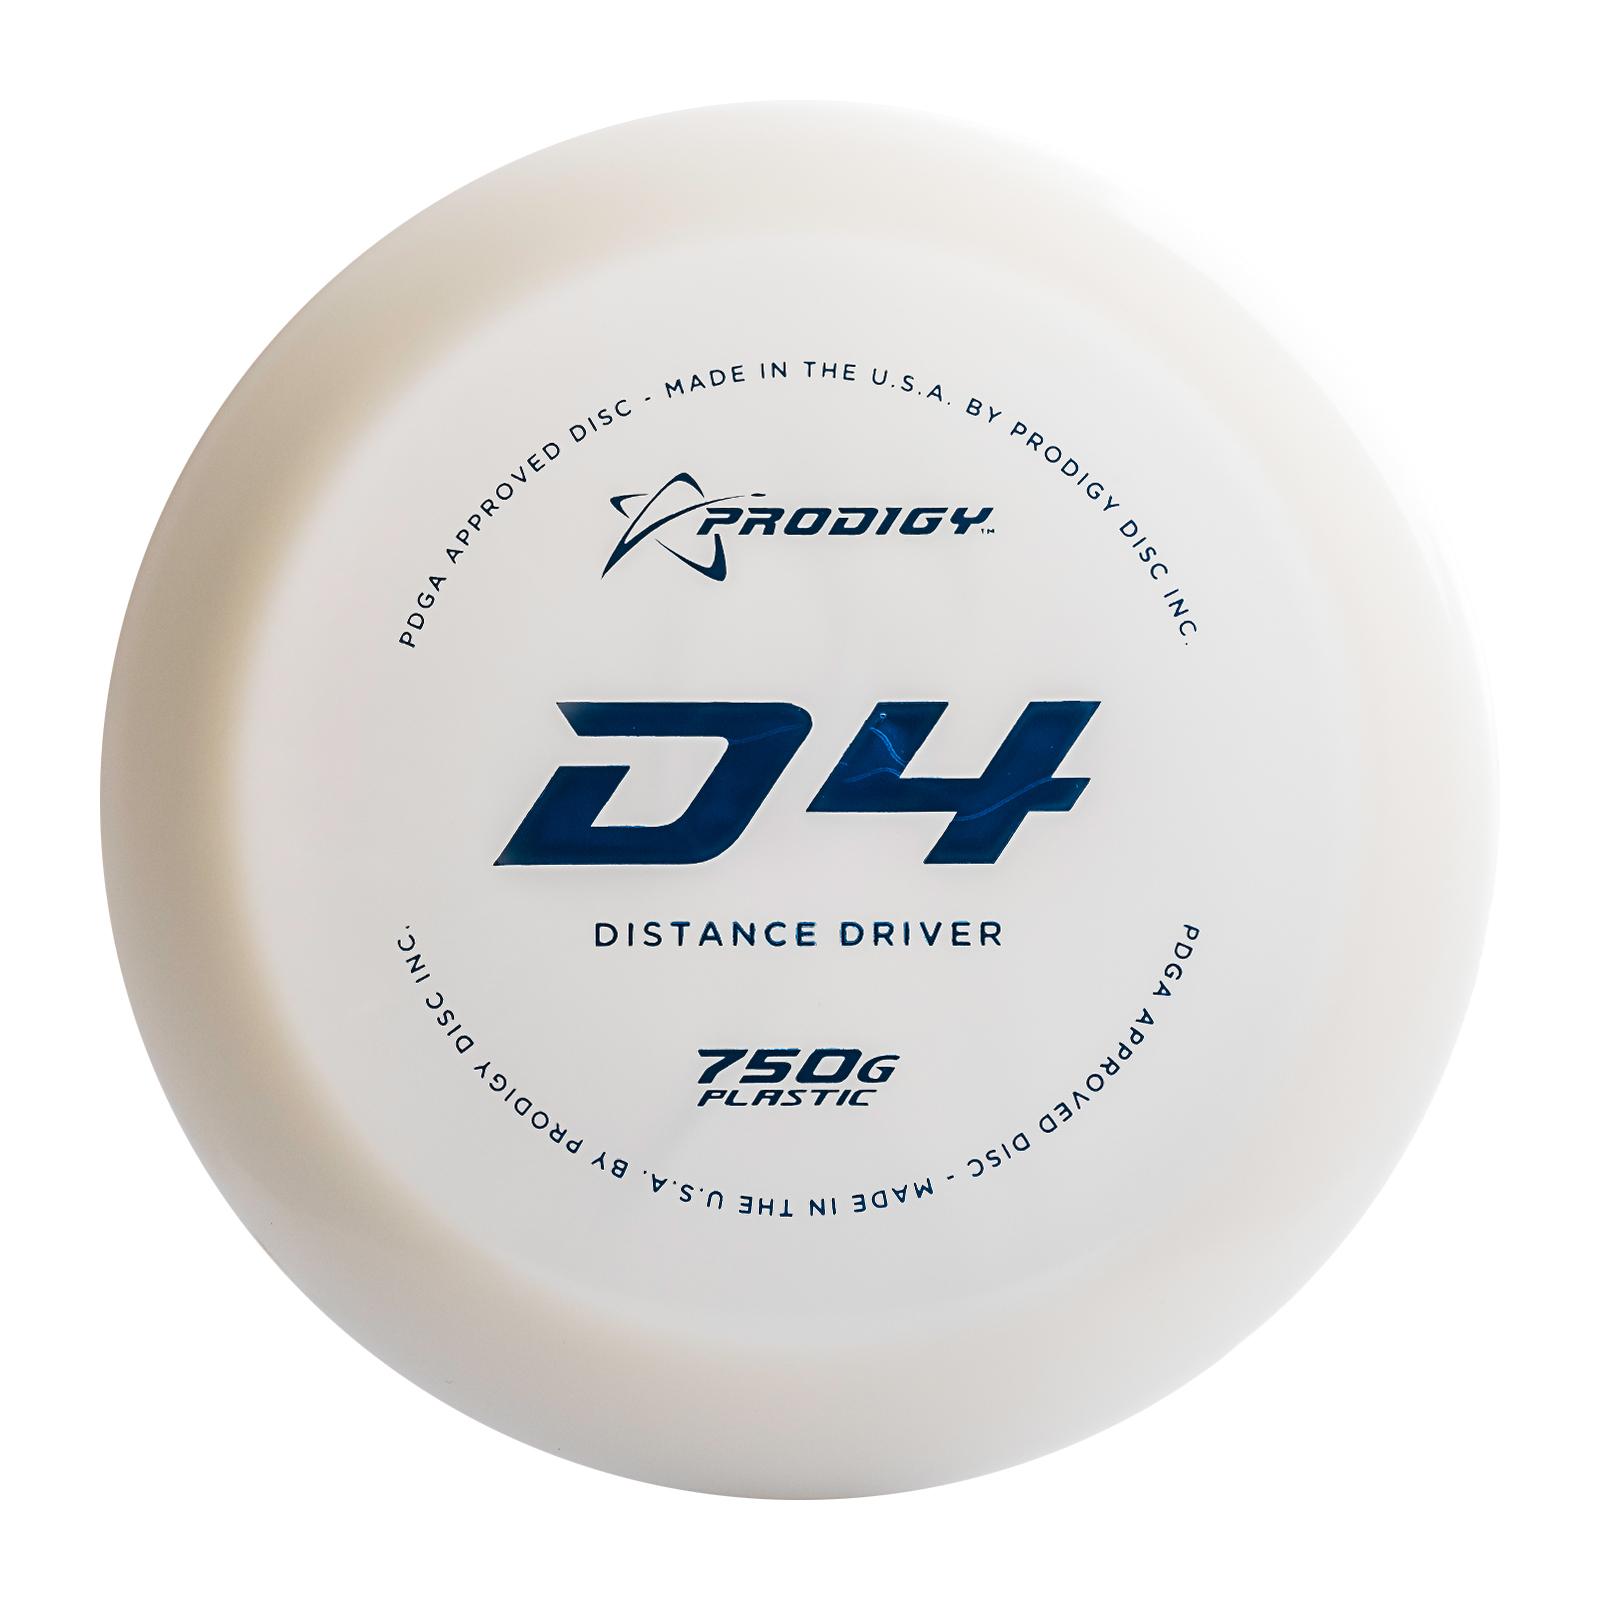 D4 - 750G PLASTIC